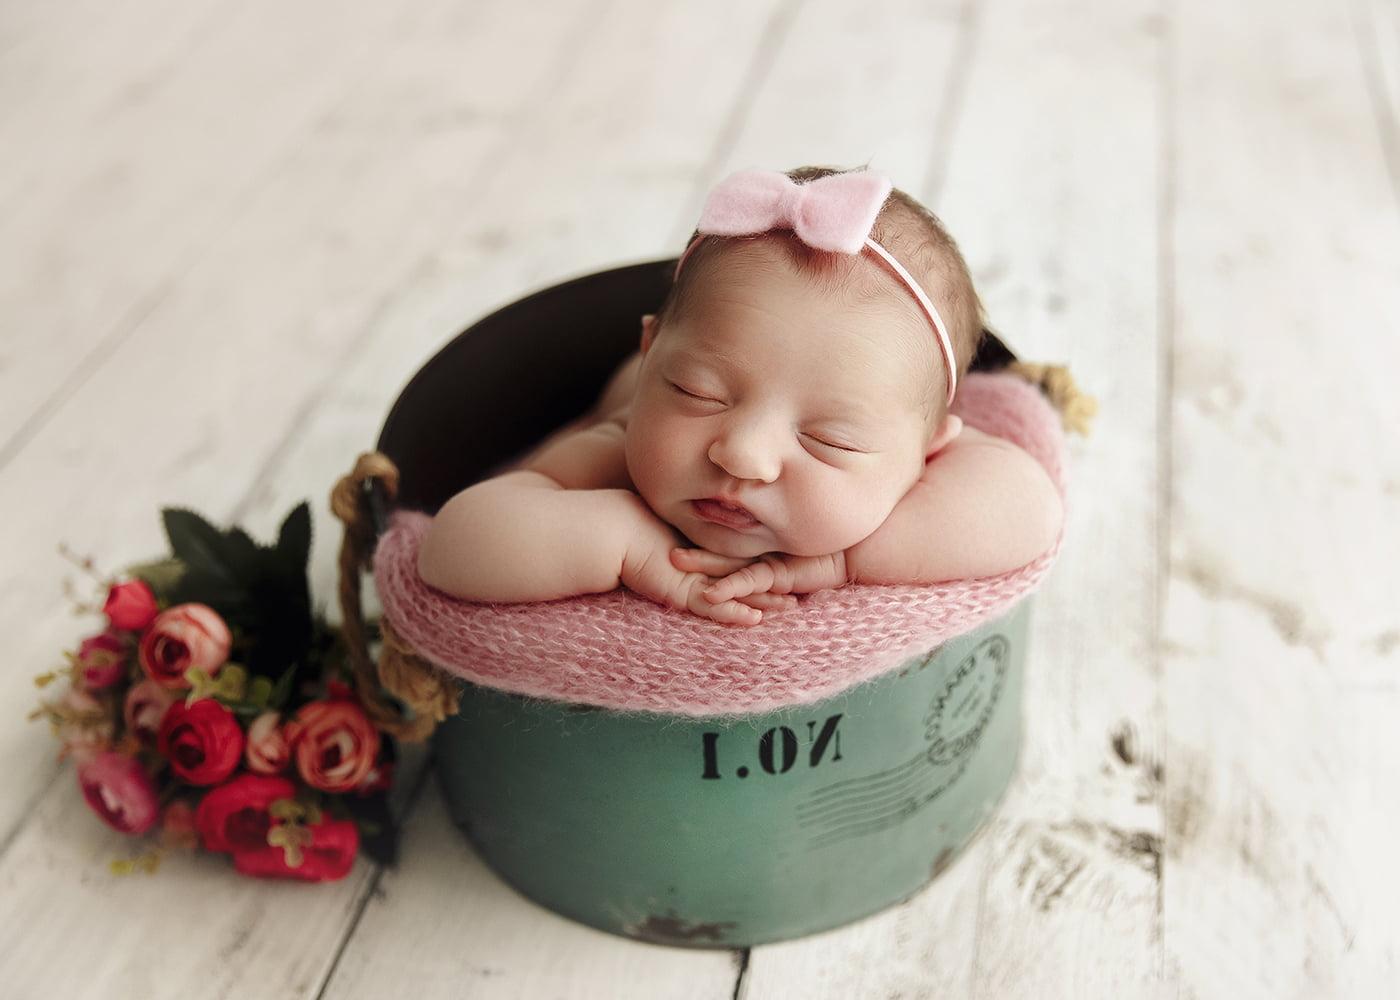 Sedinta foto nou nascut - intrebari si raspunsuri